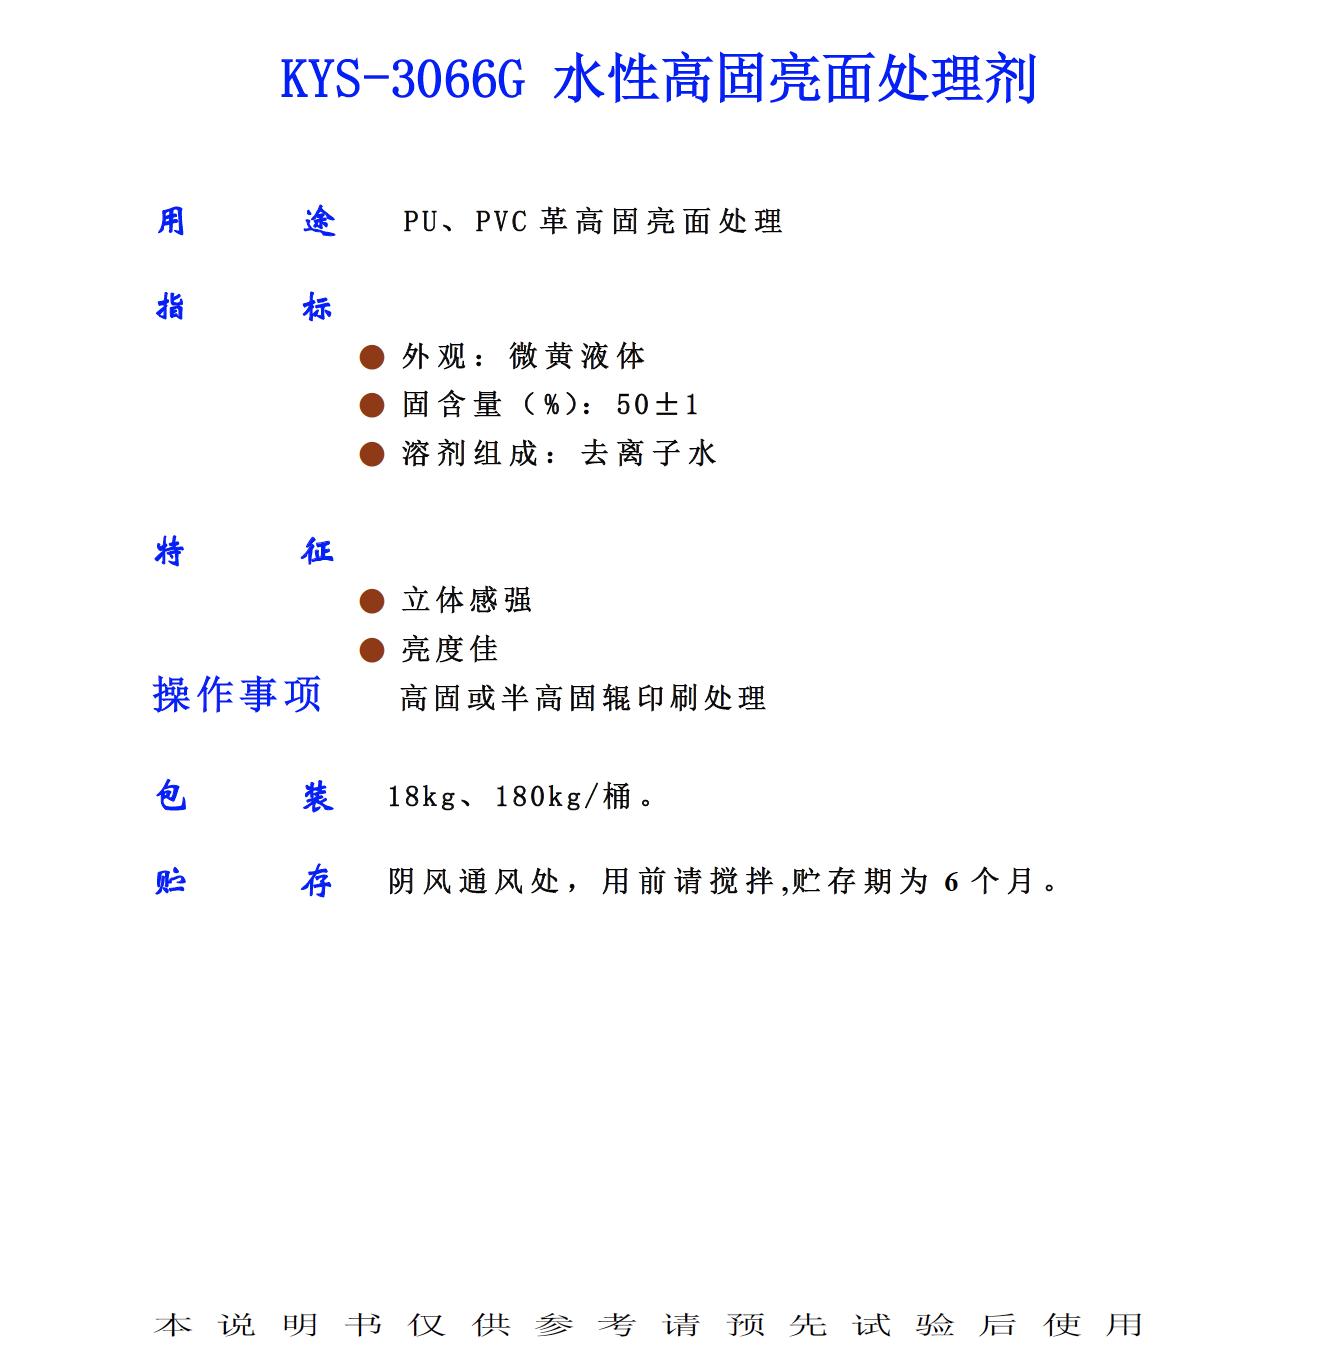 KYS 3066G 水性高固亮面处理剂